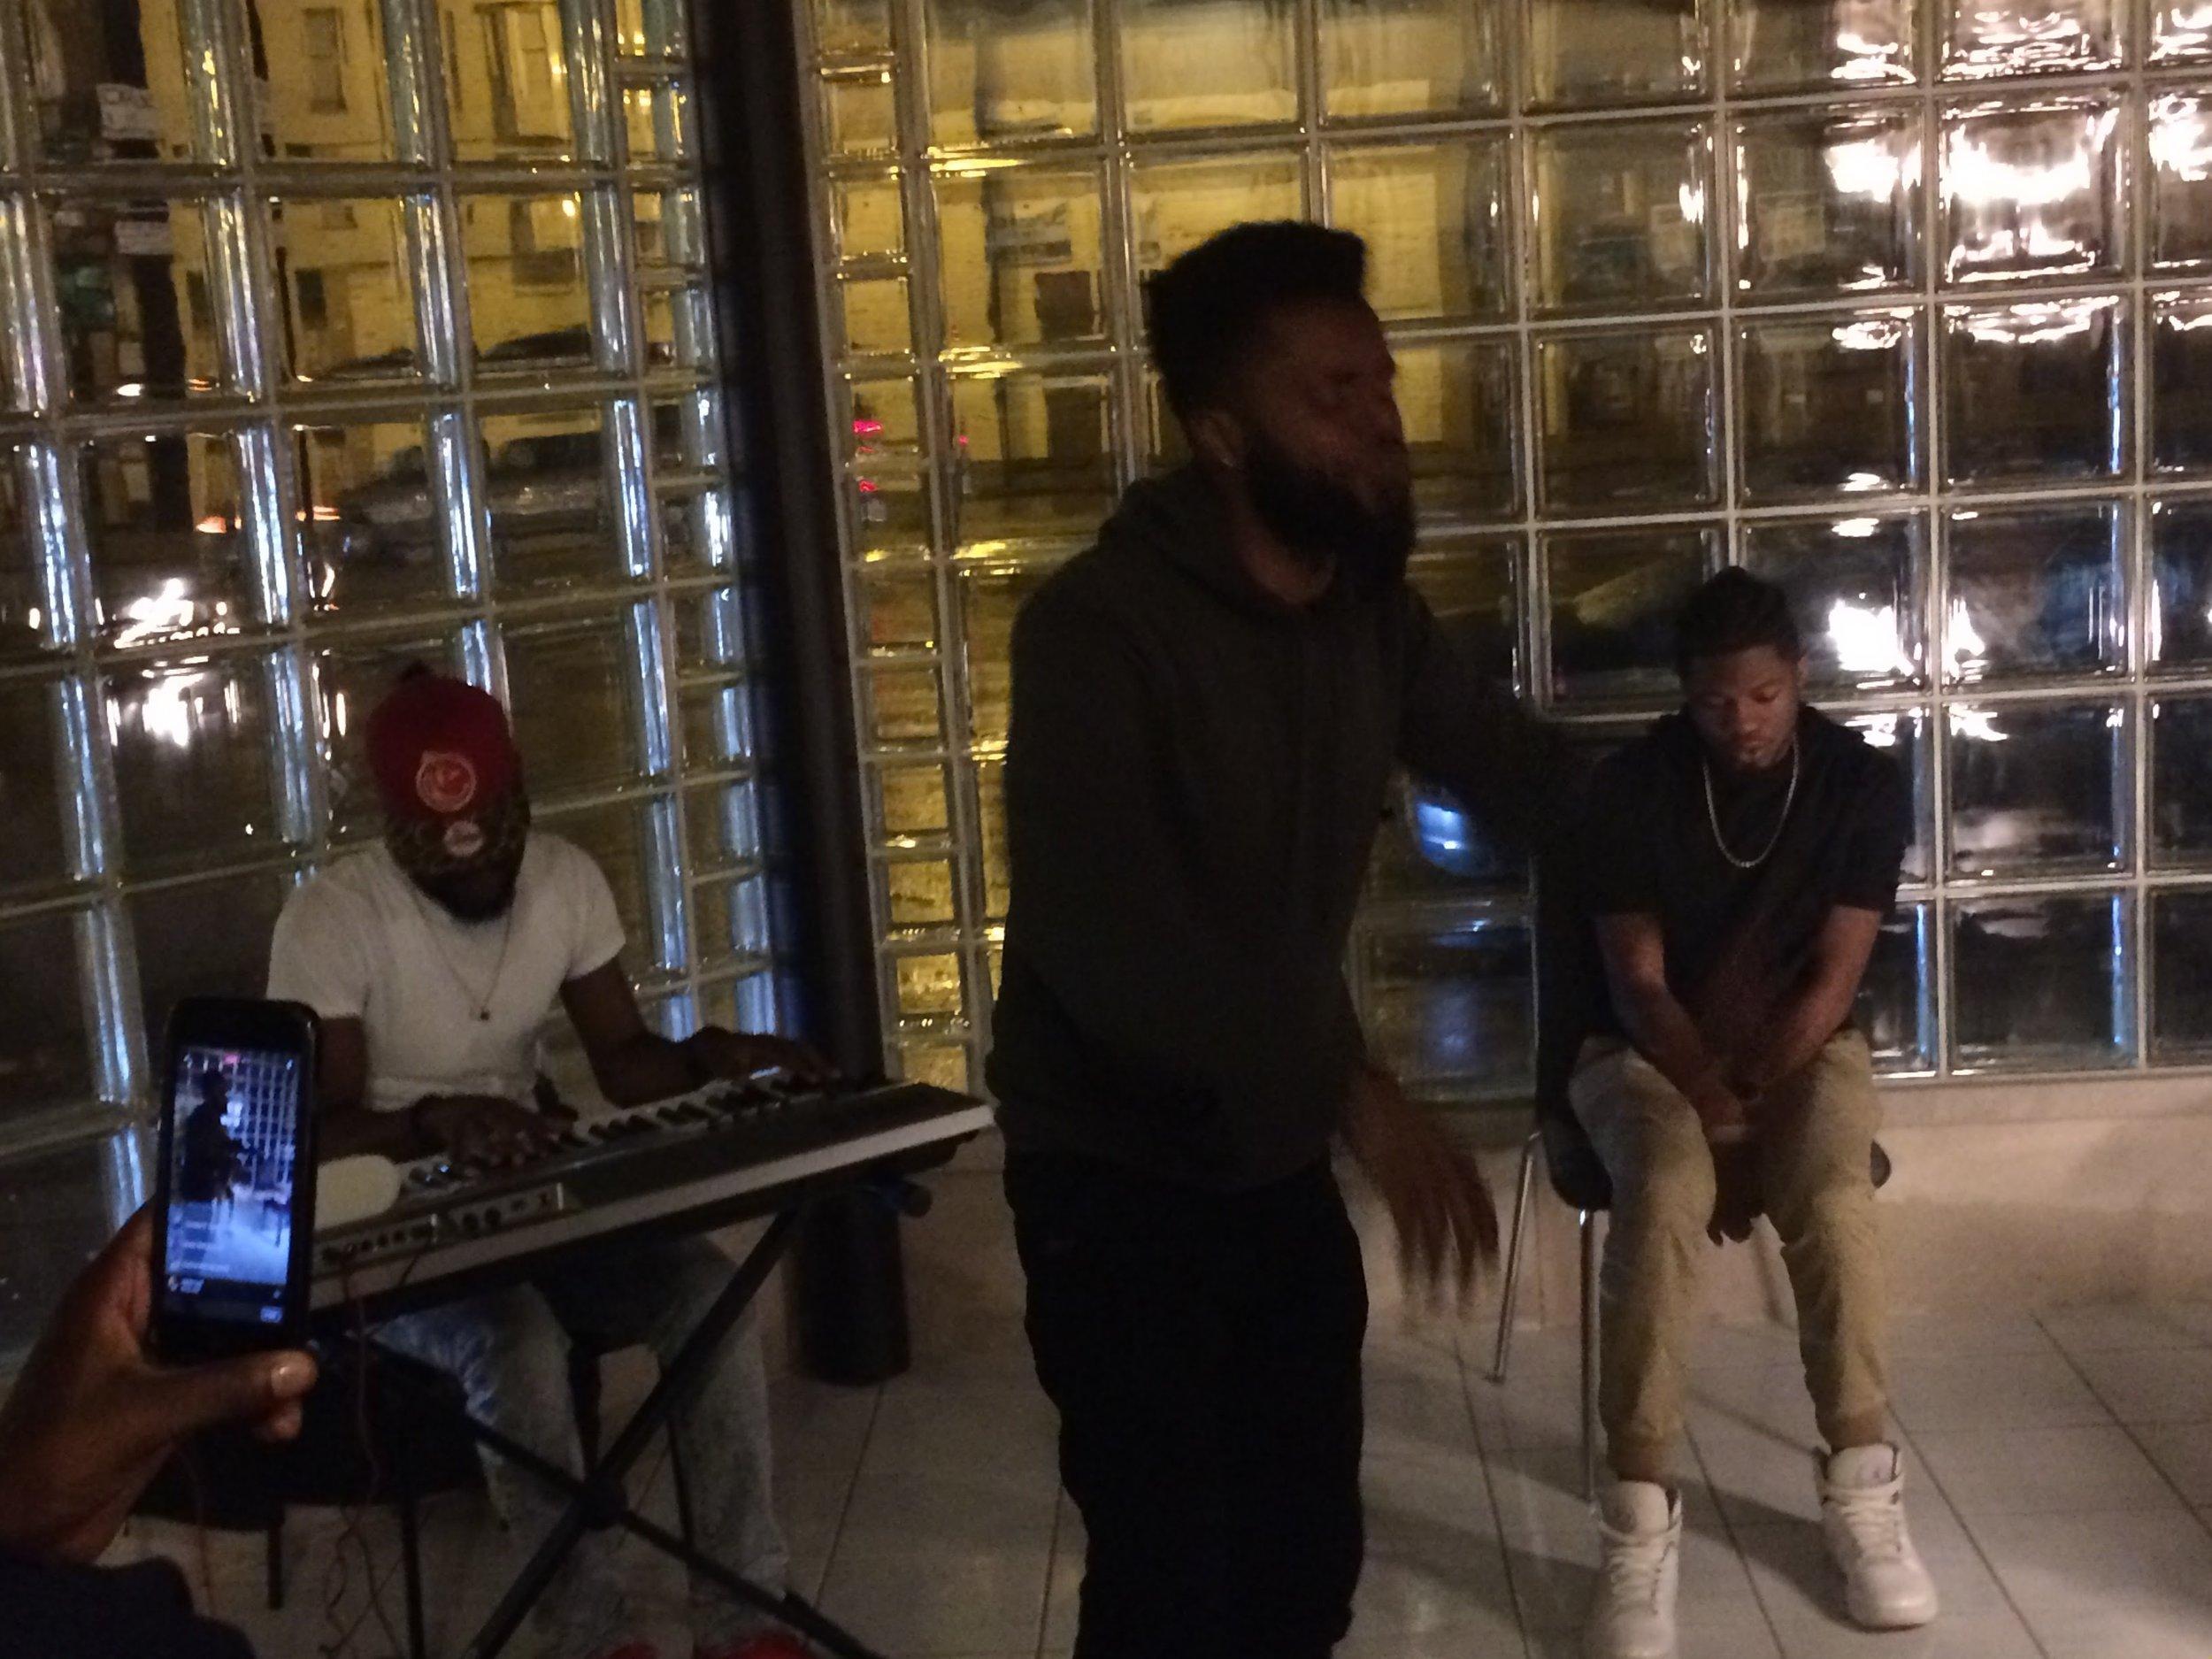 R.O.E. performs